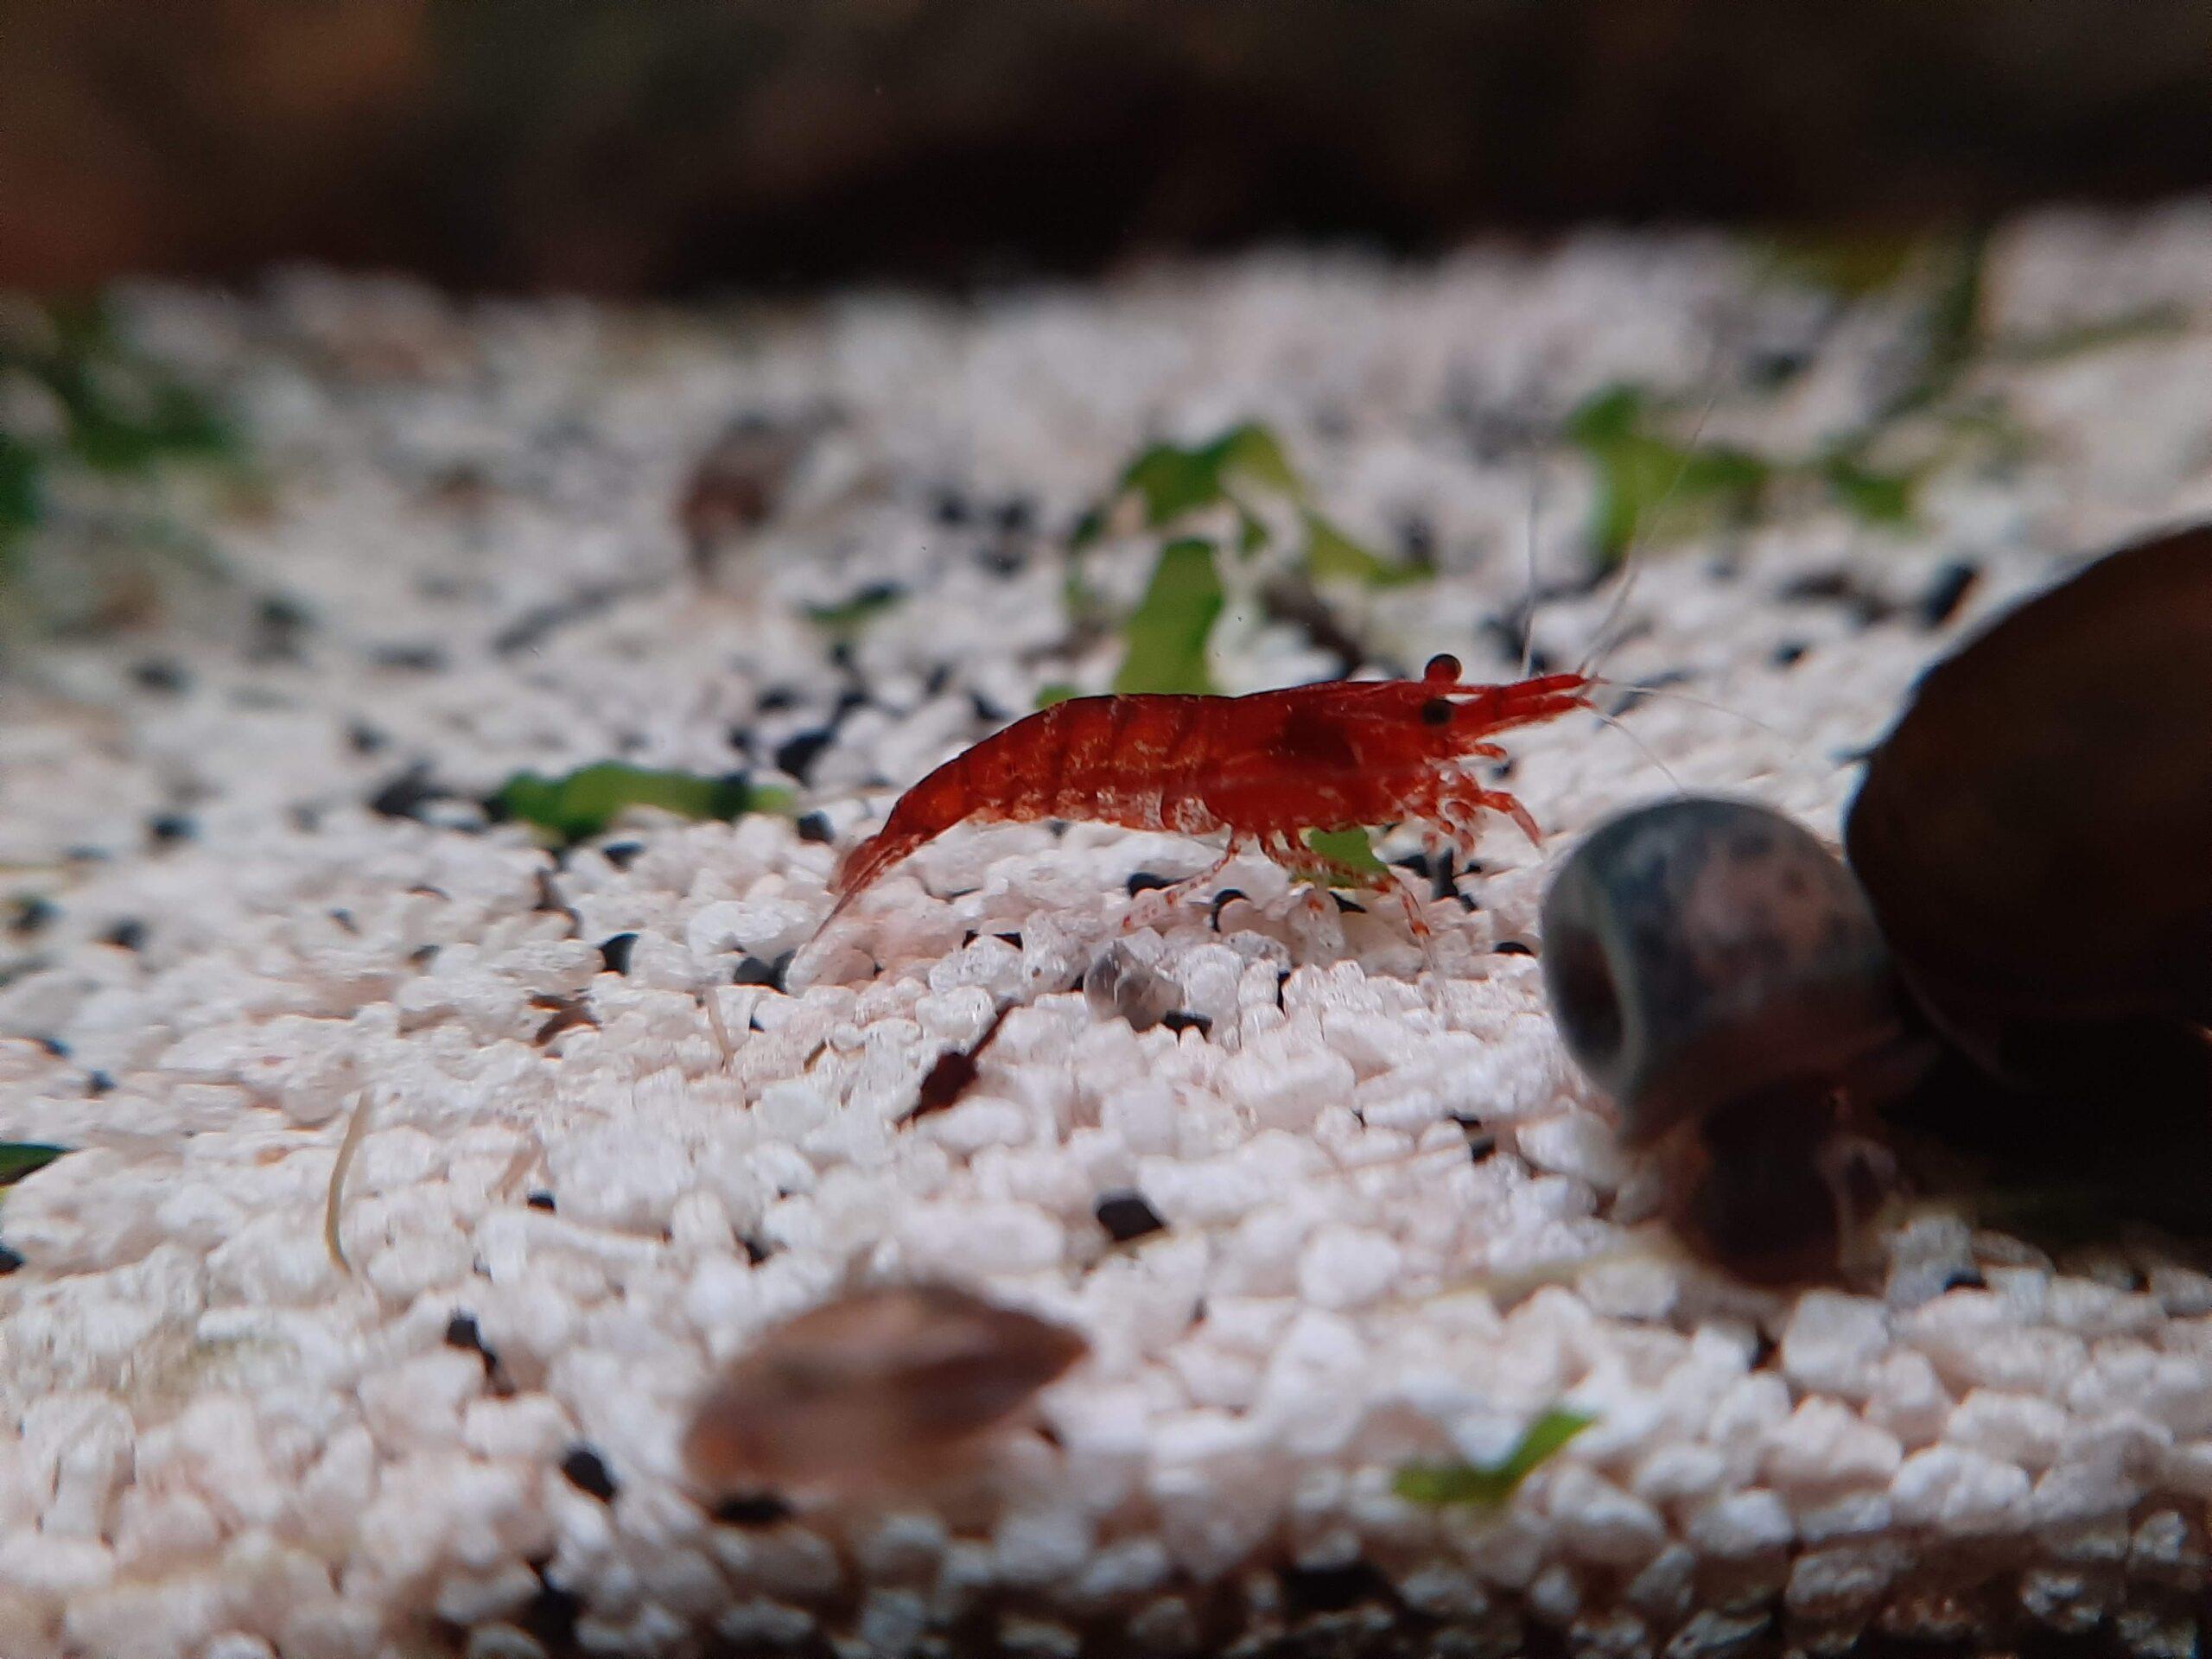 Breeding freshwater shrimp